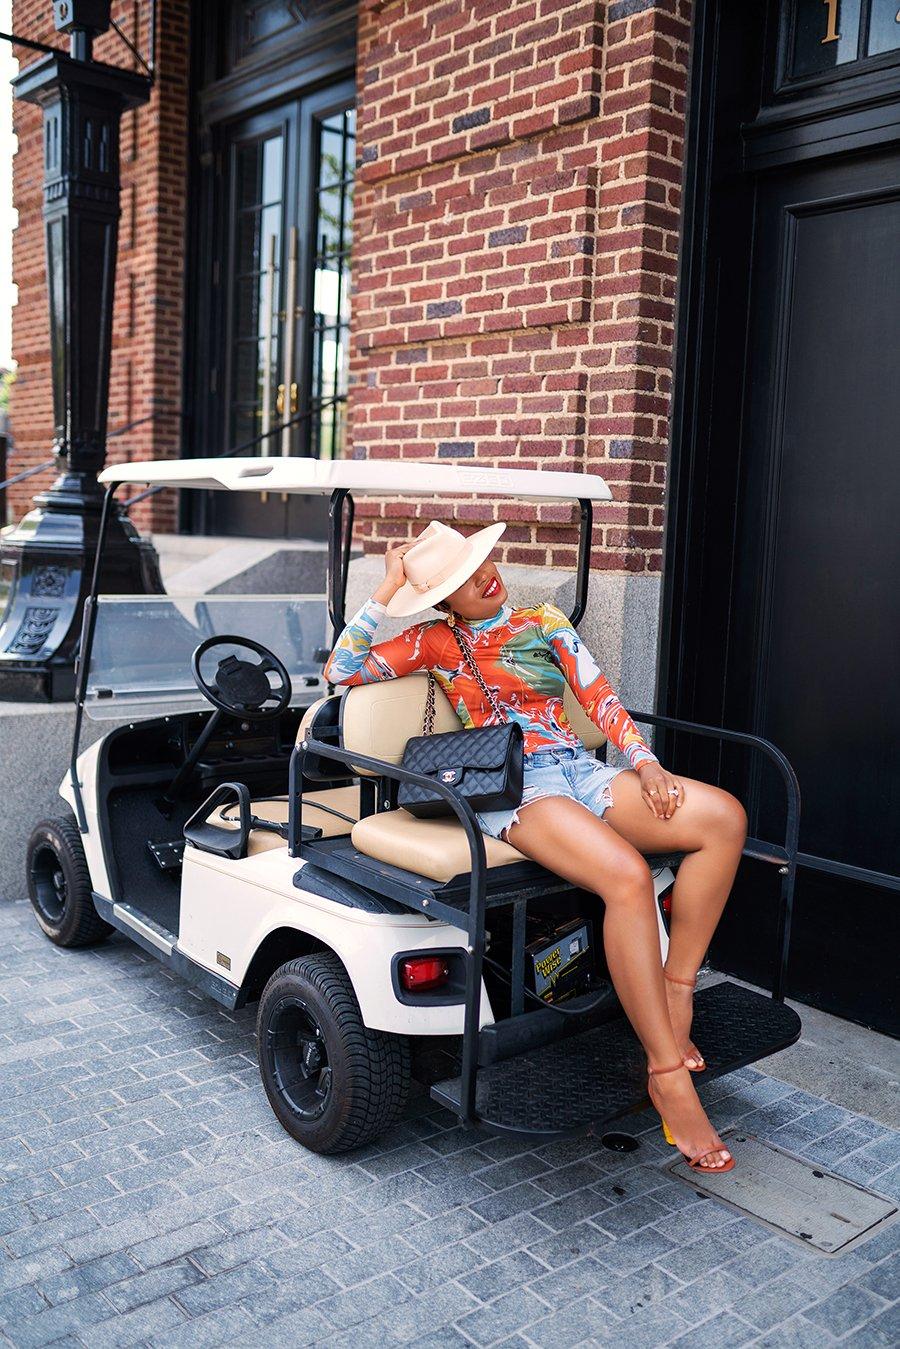 stella-adewunmi-of-jadore-fashion-blog-shares-summer-shorts-denim-shorts-vacation-style